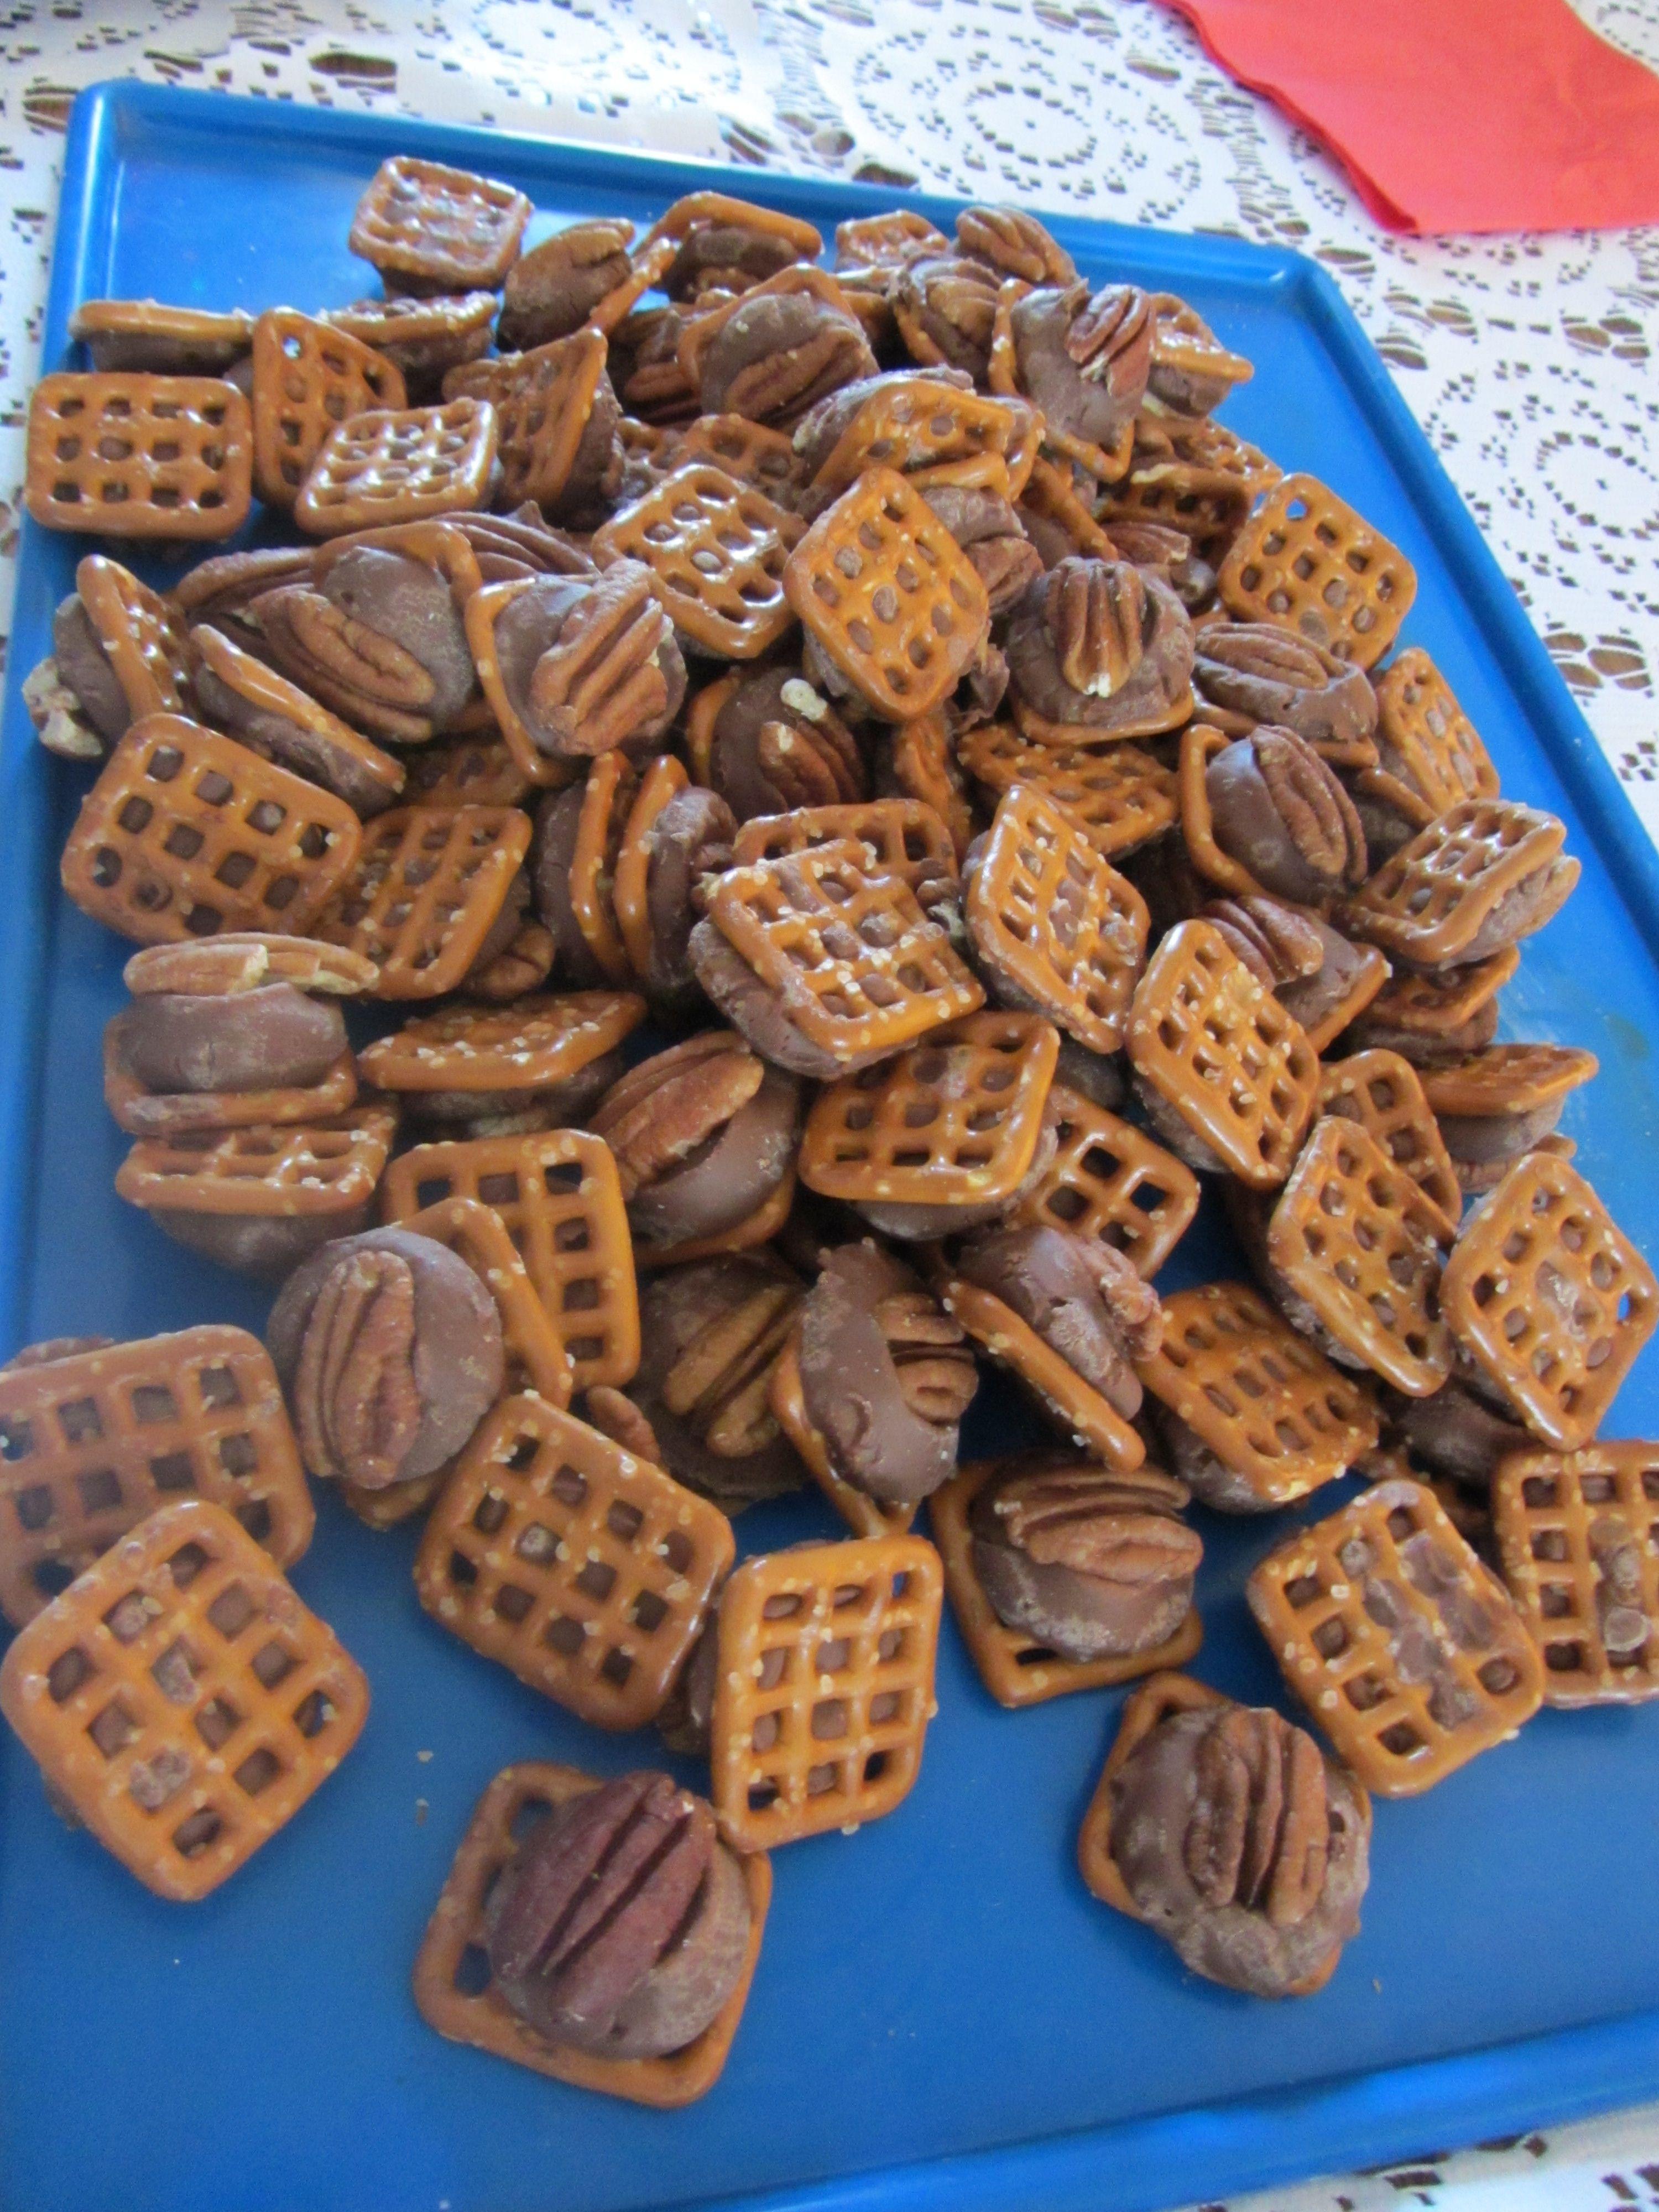 Cookie-Baking-Day-008.jpg 3,000×4,000 pixels